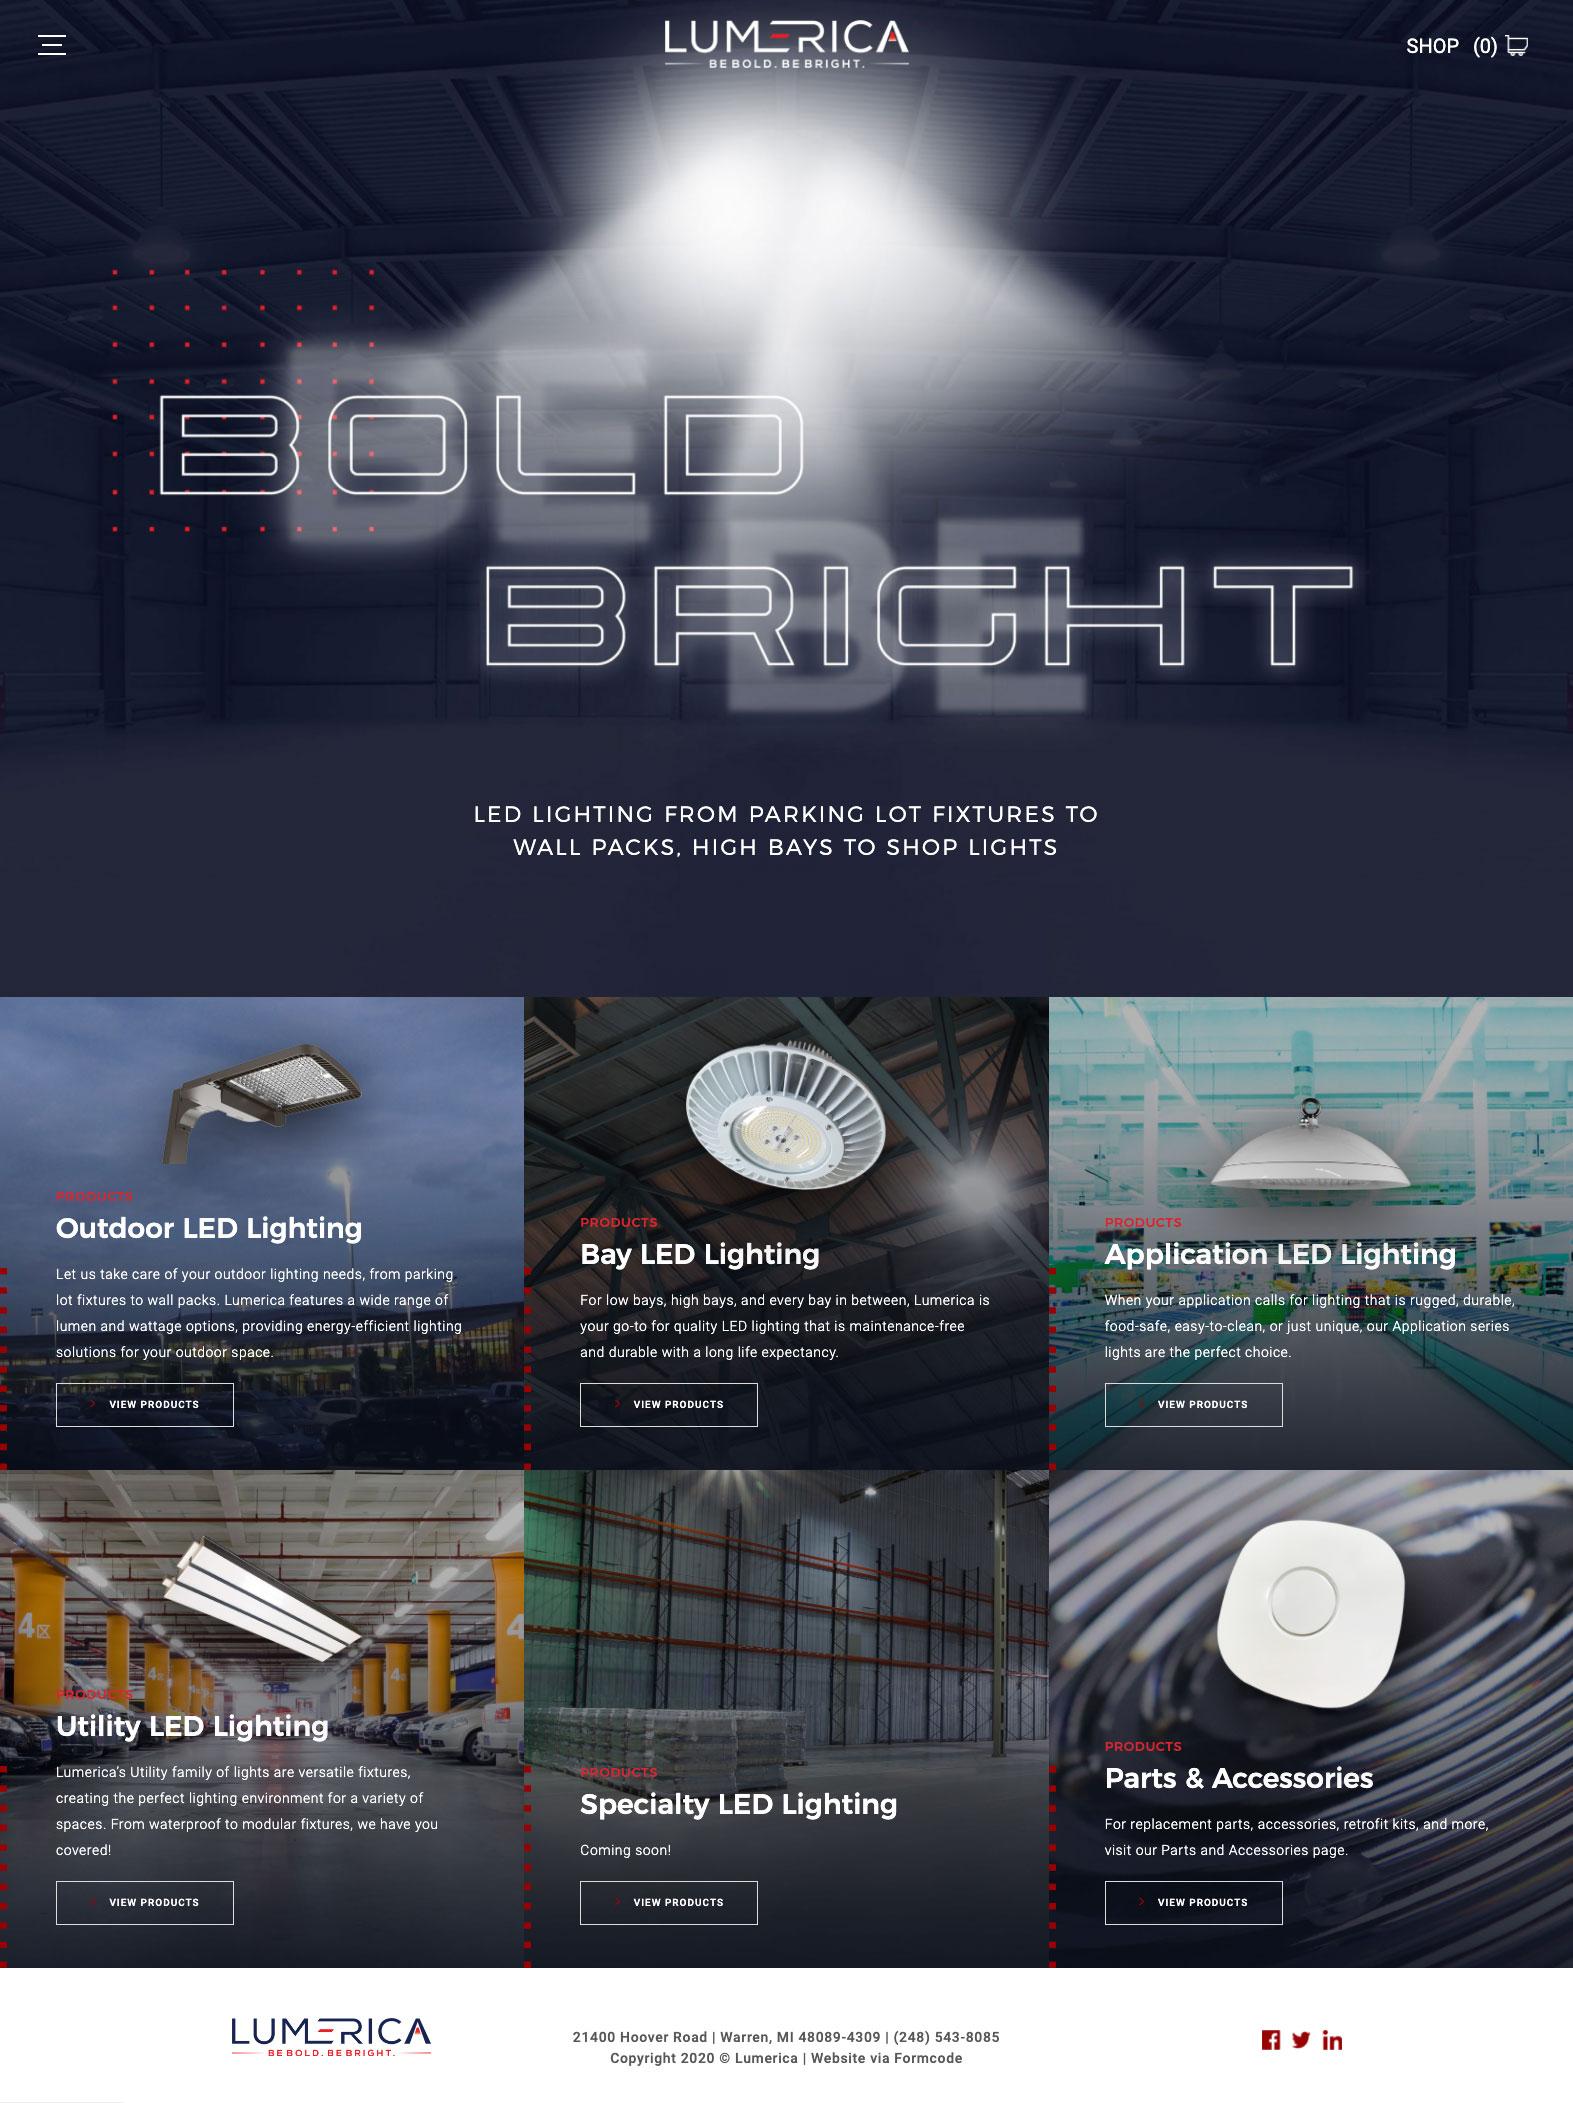 Lumerica Lighting E-commerce Web Design